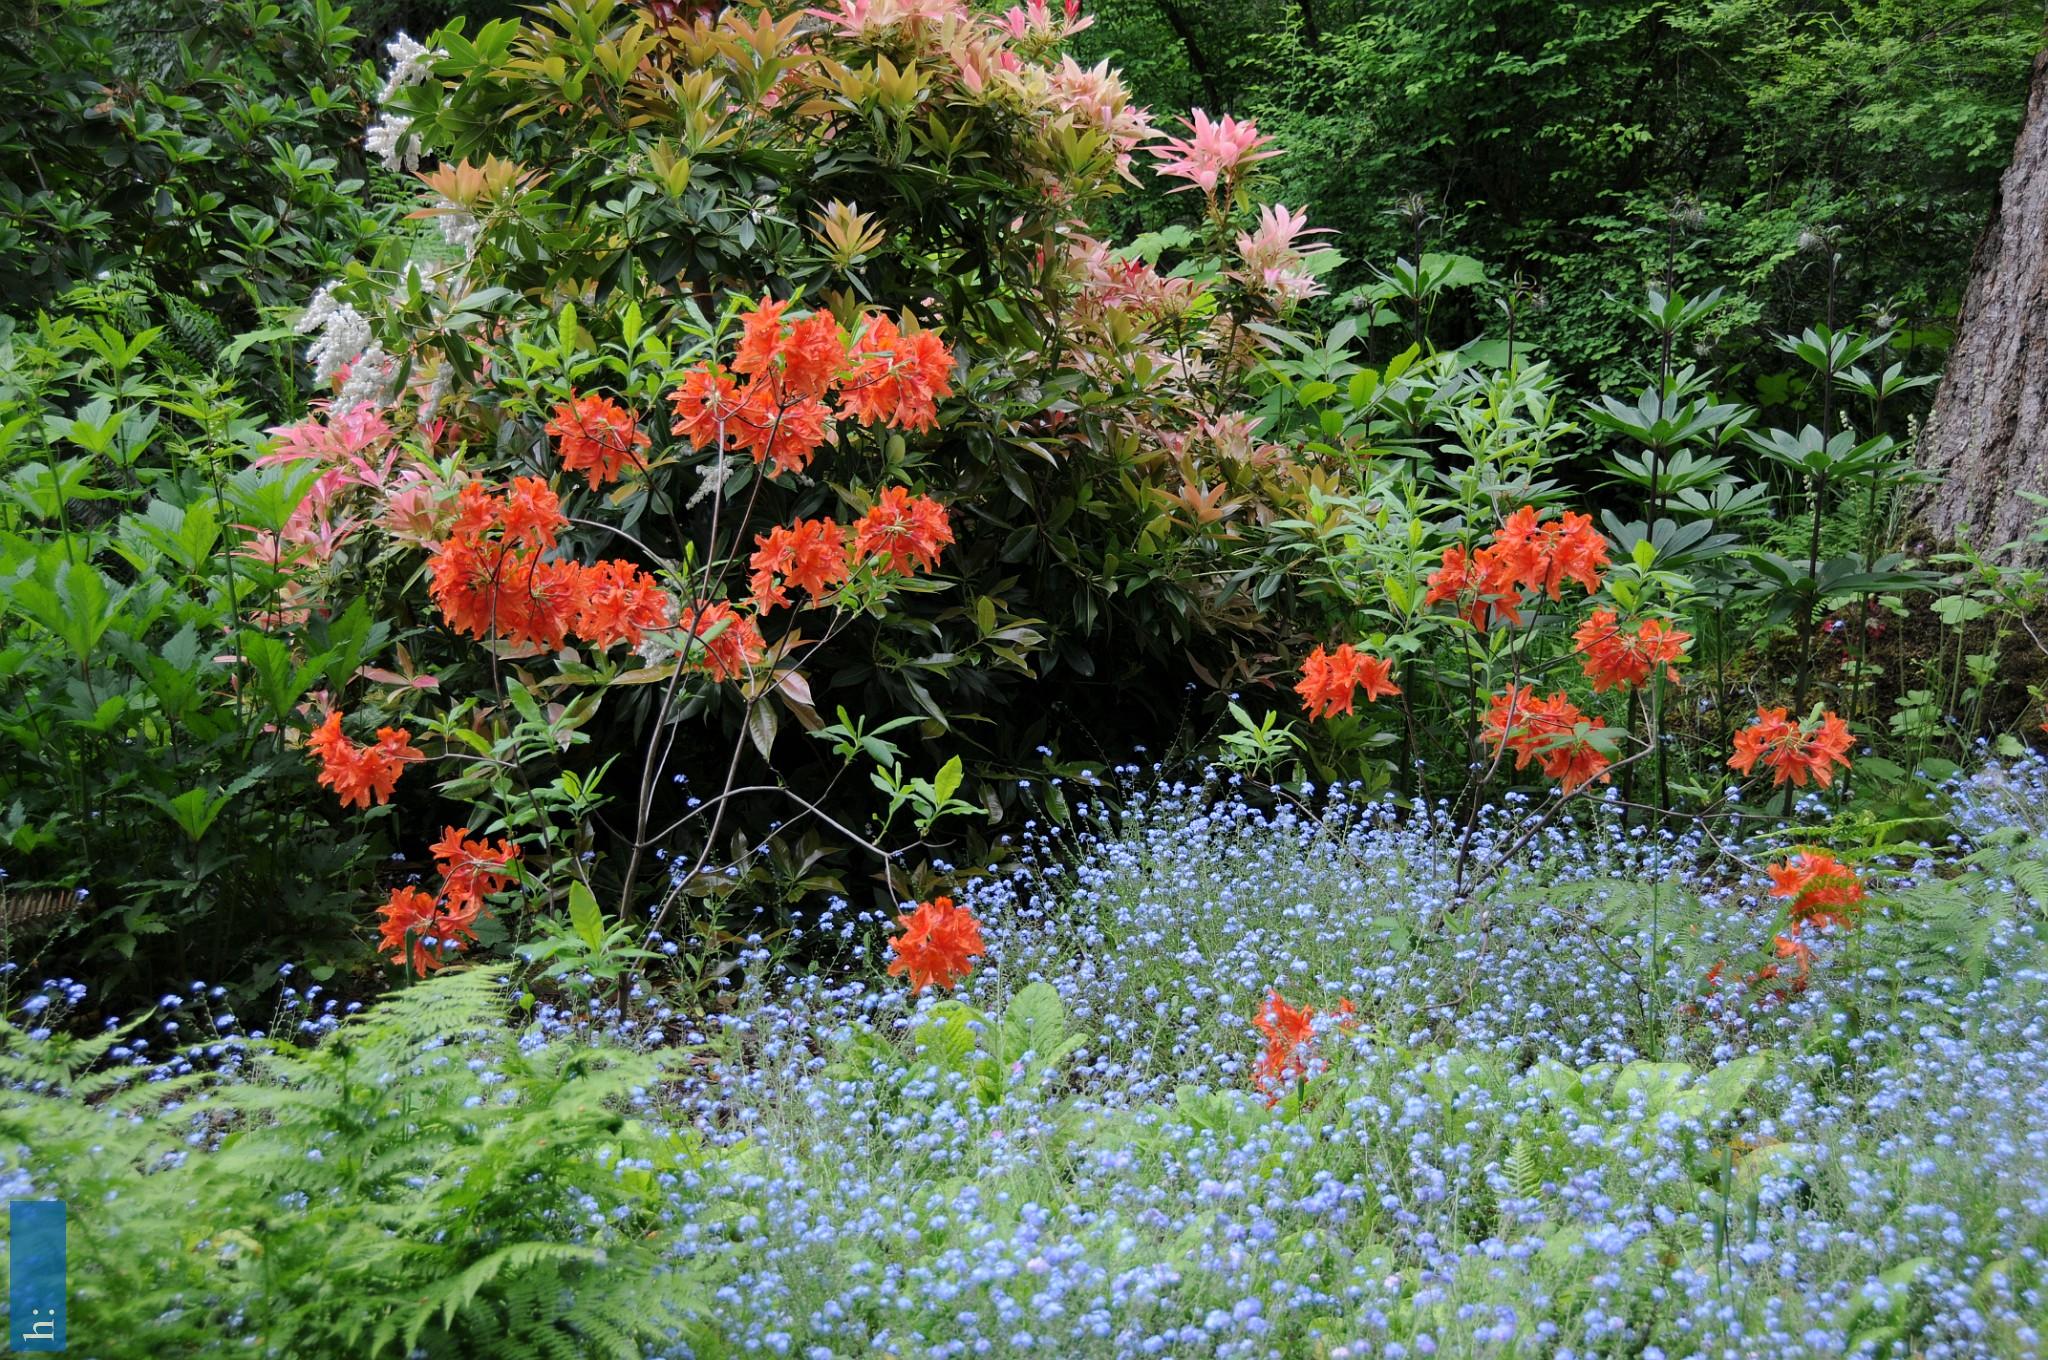 BC, Vancouver Island, Milner Gardens & Woodlands